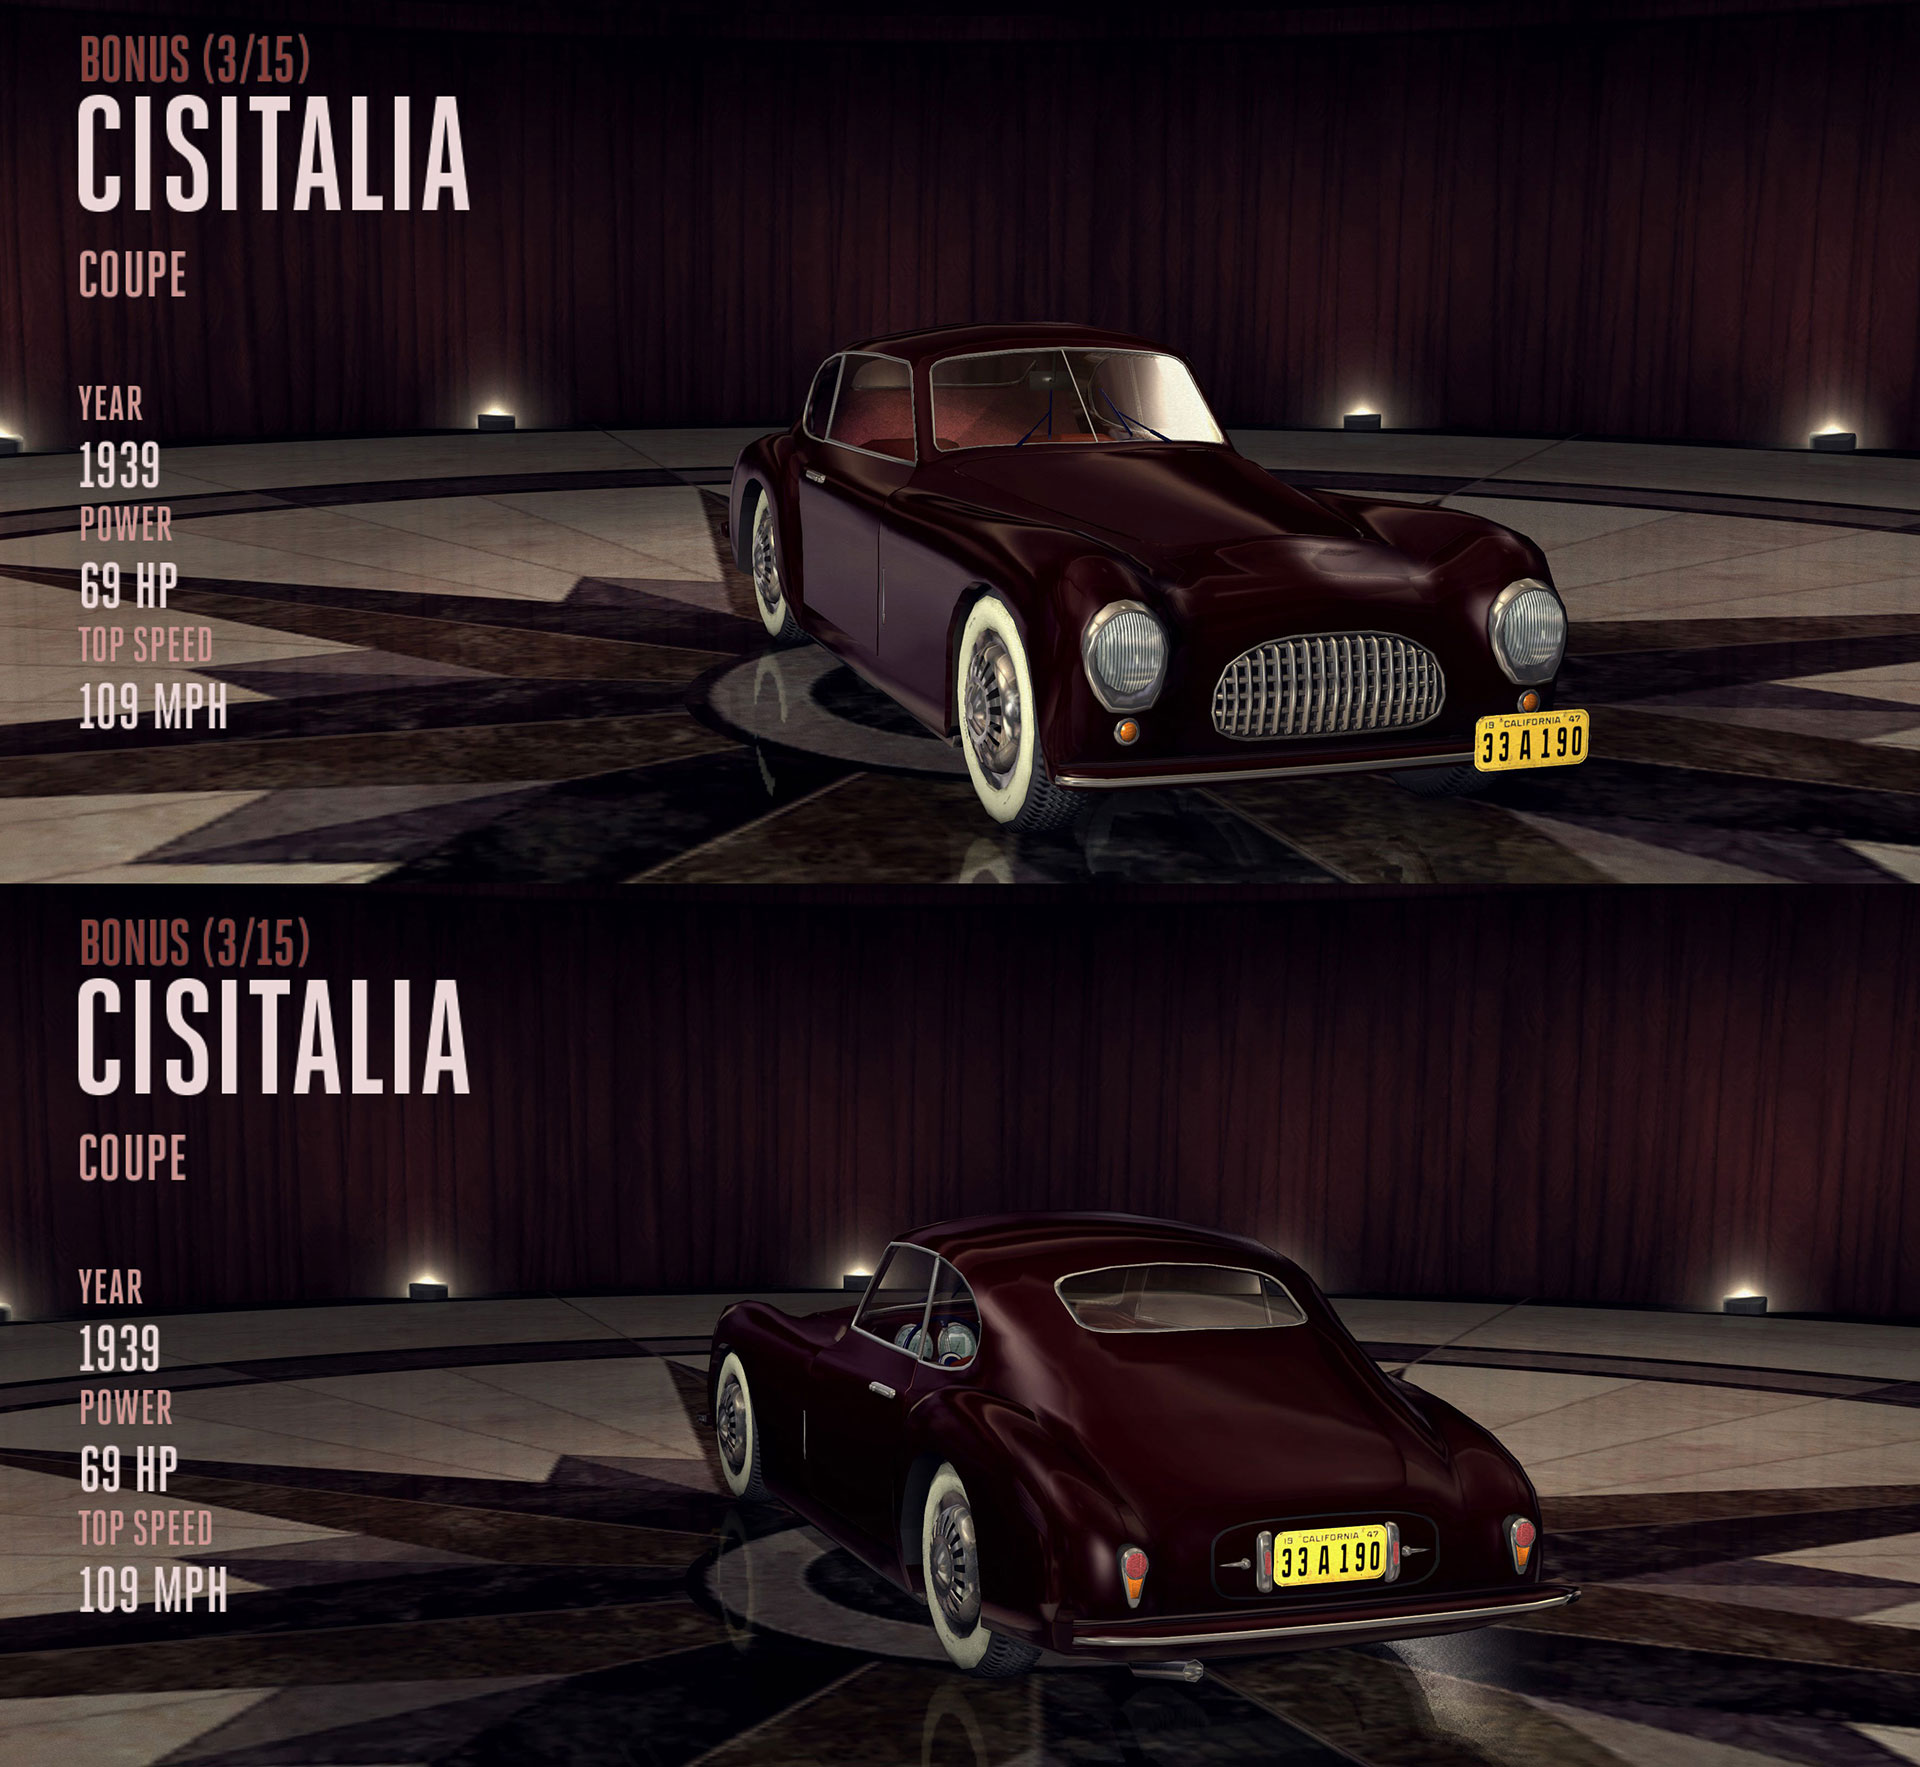 Archivo:1939-cisitalia-coupe.jpg